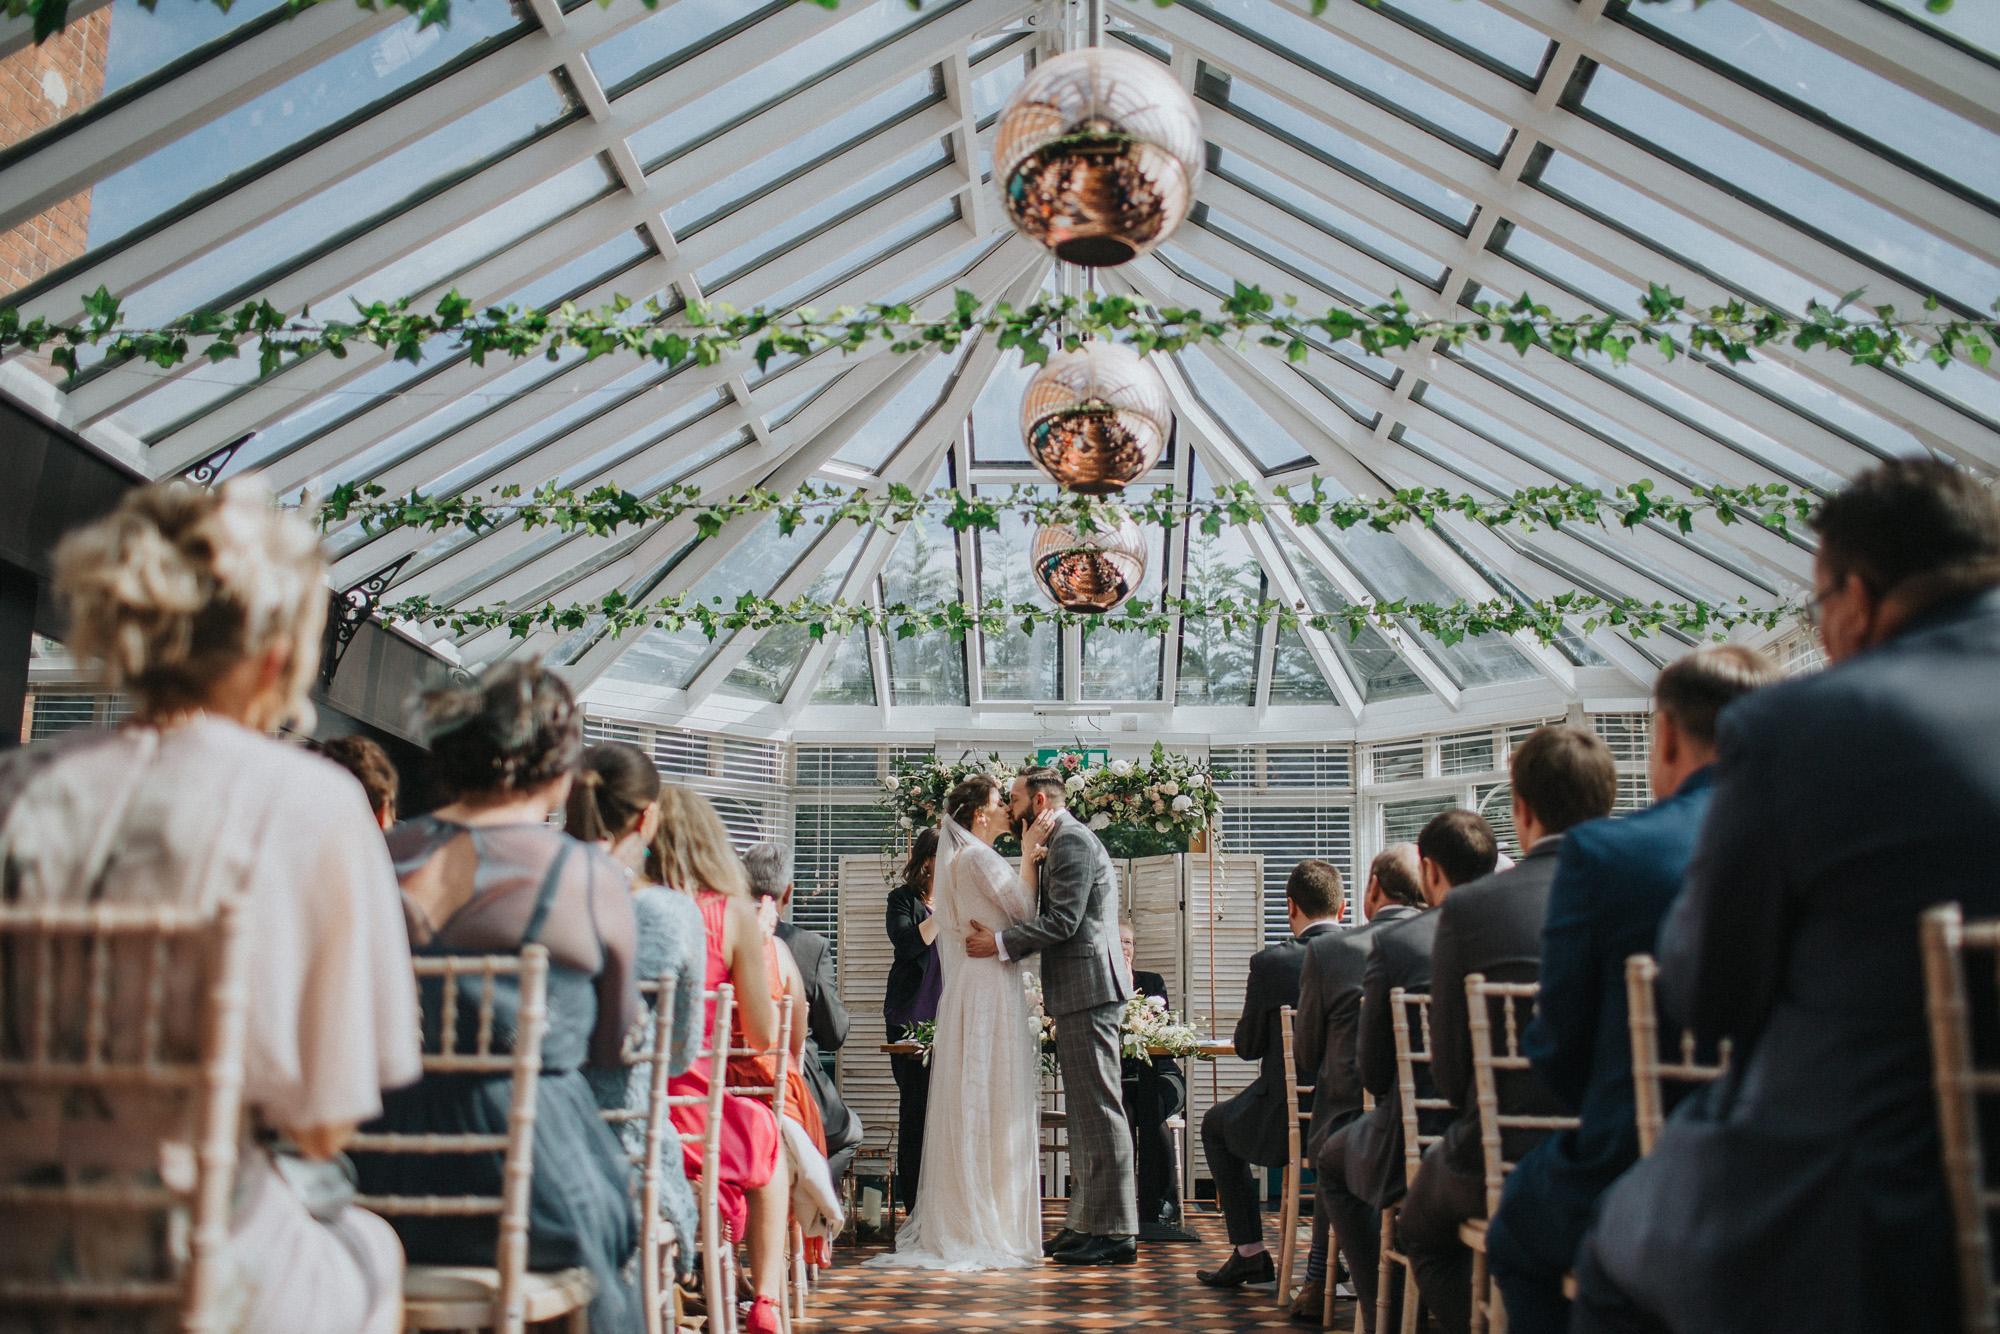 Kate-Beaumont-Lace-Flared-Dahlia-Gown-Leeds-Wedding-Bloom-Weddings-25.jpg